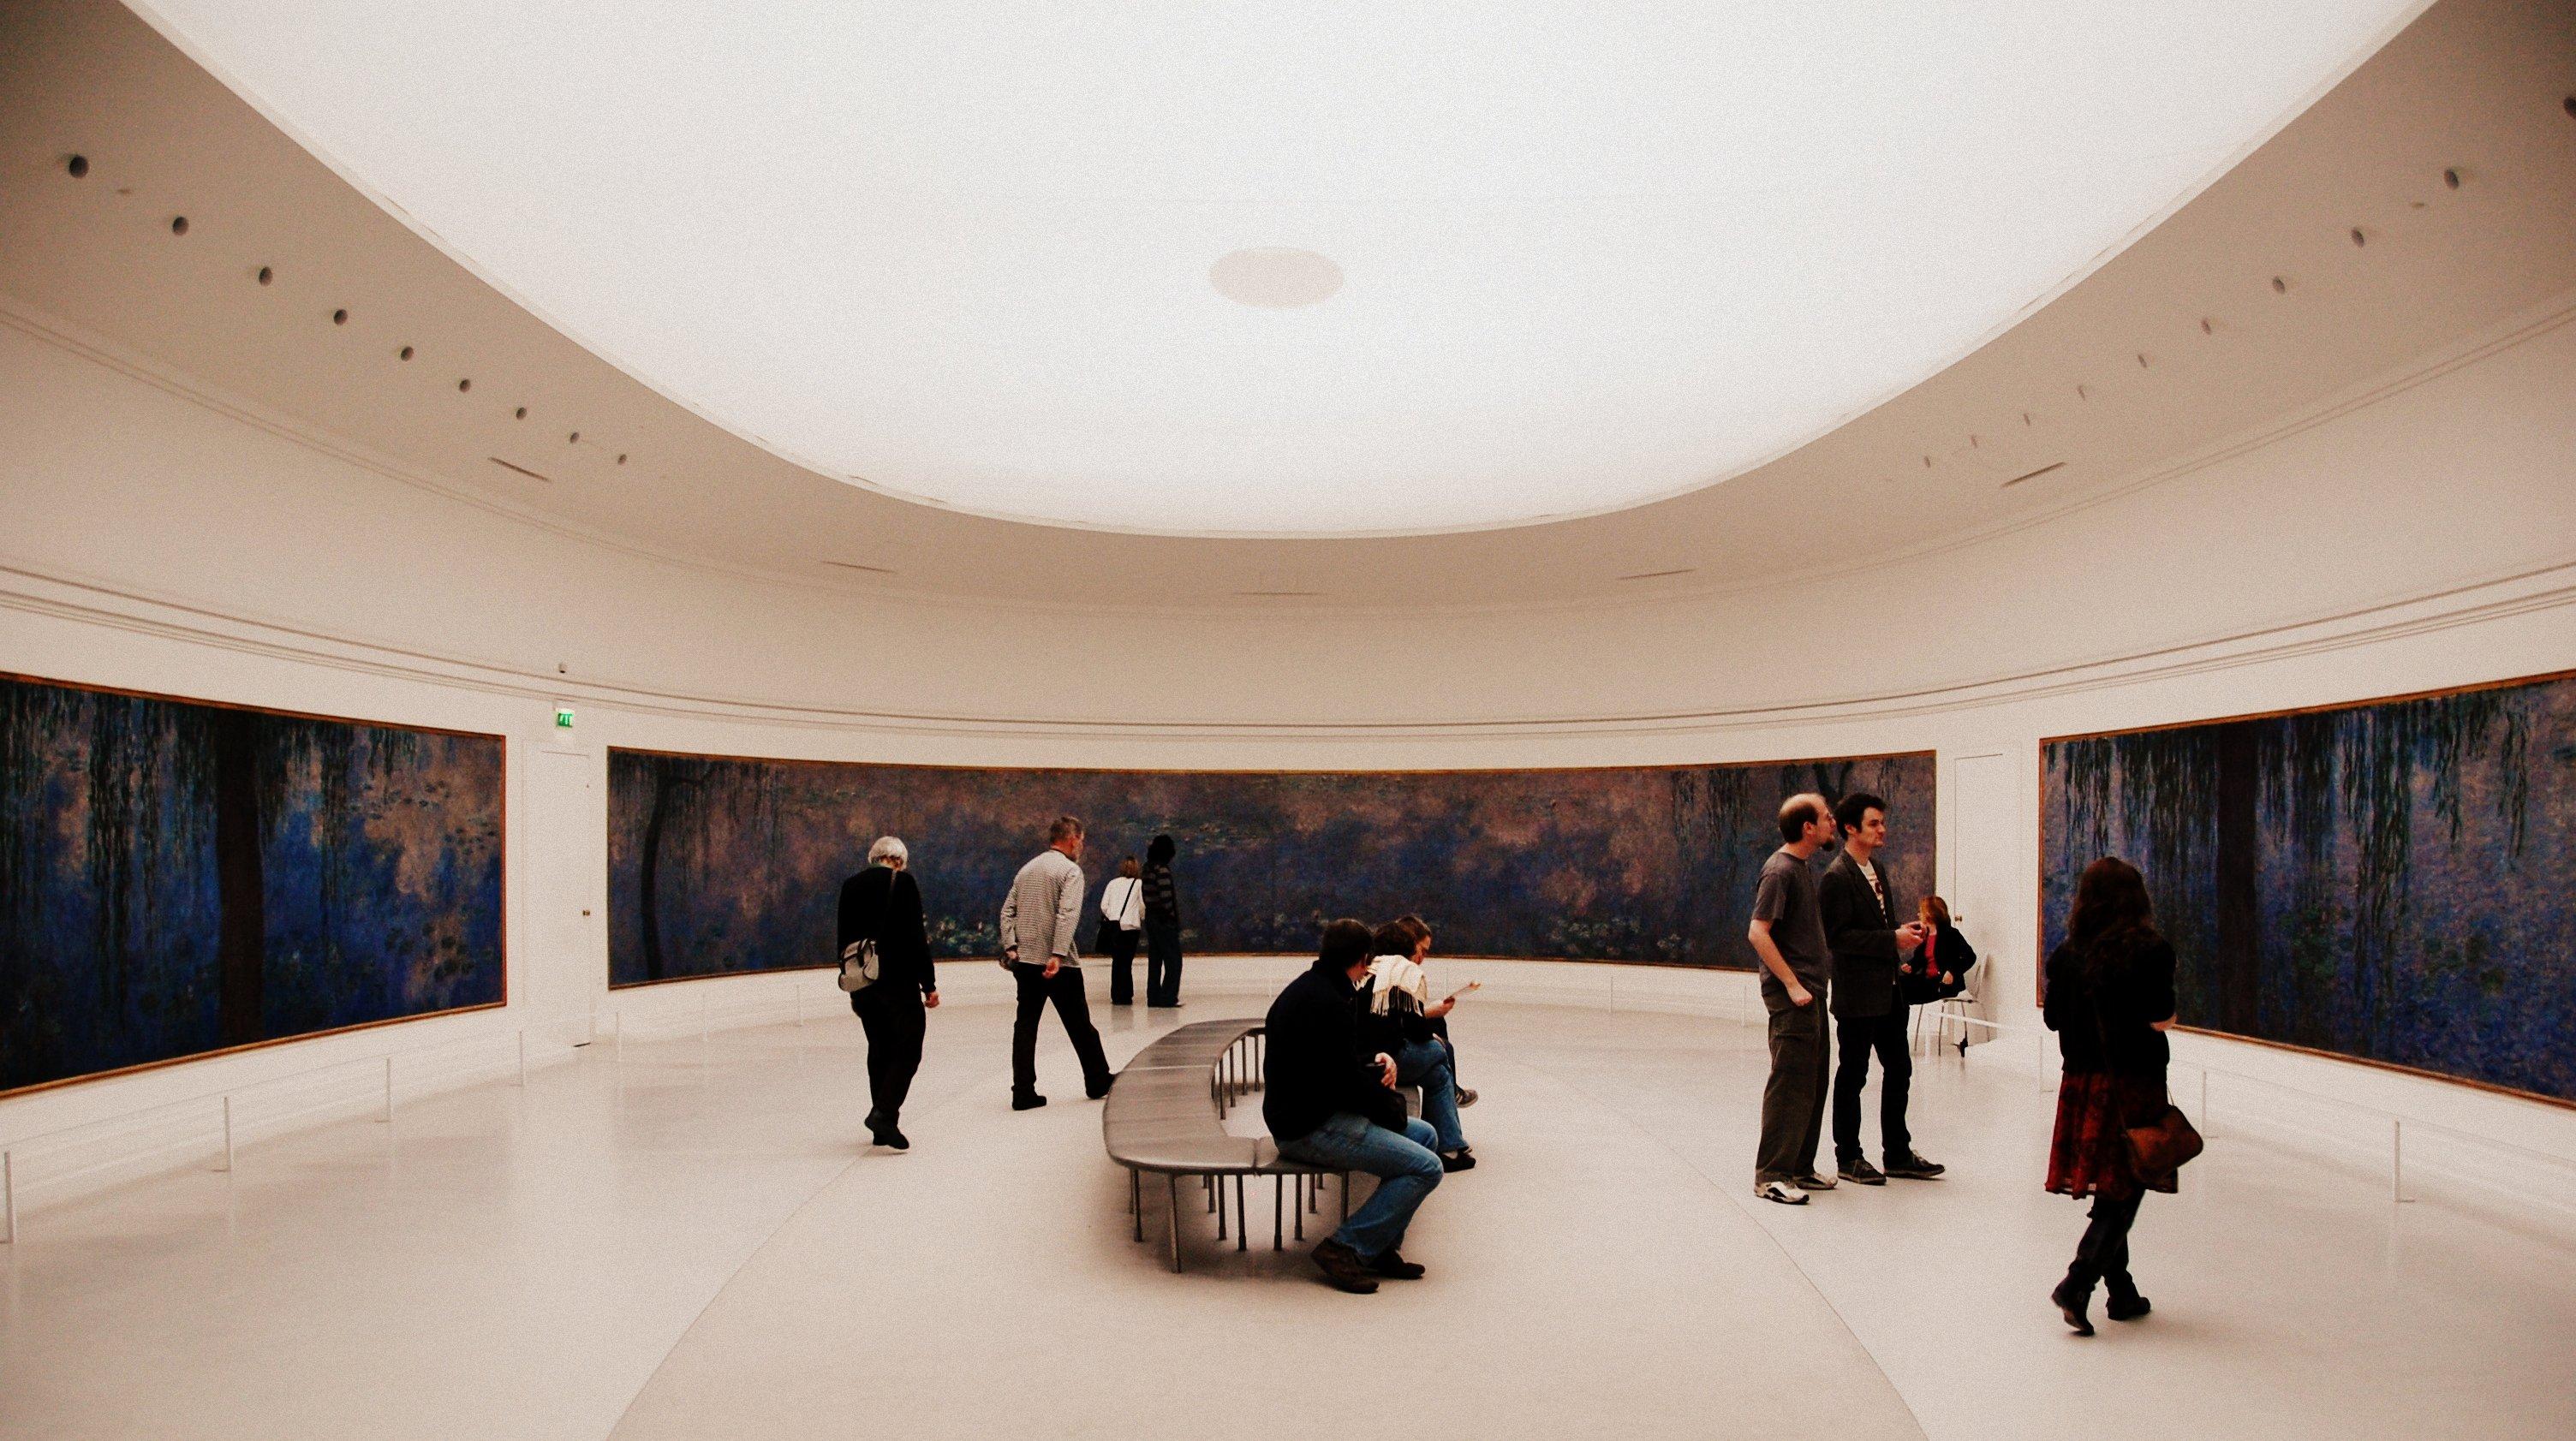 Musée_de_l'Orangerie_February_28,_2009